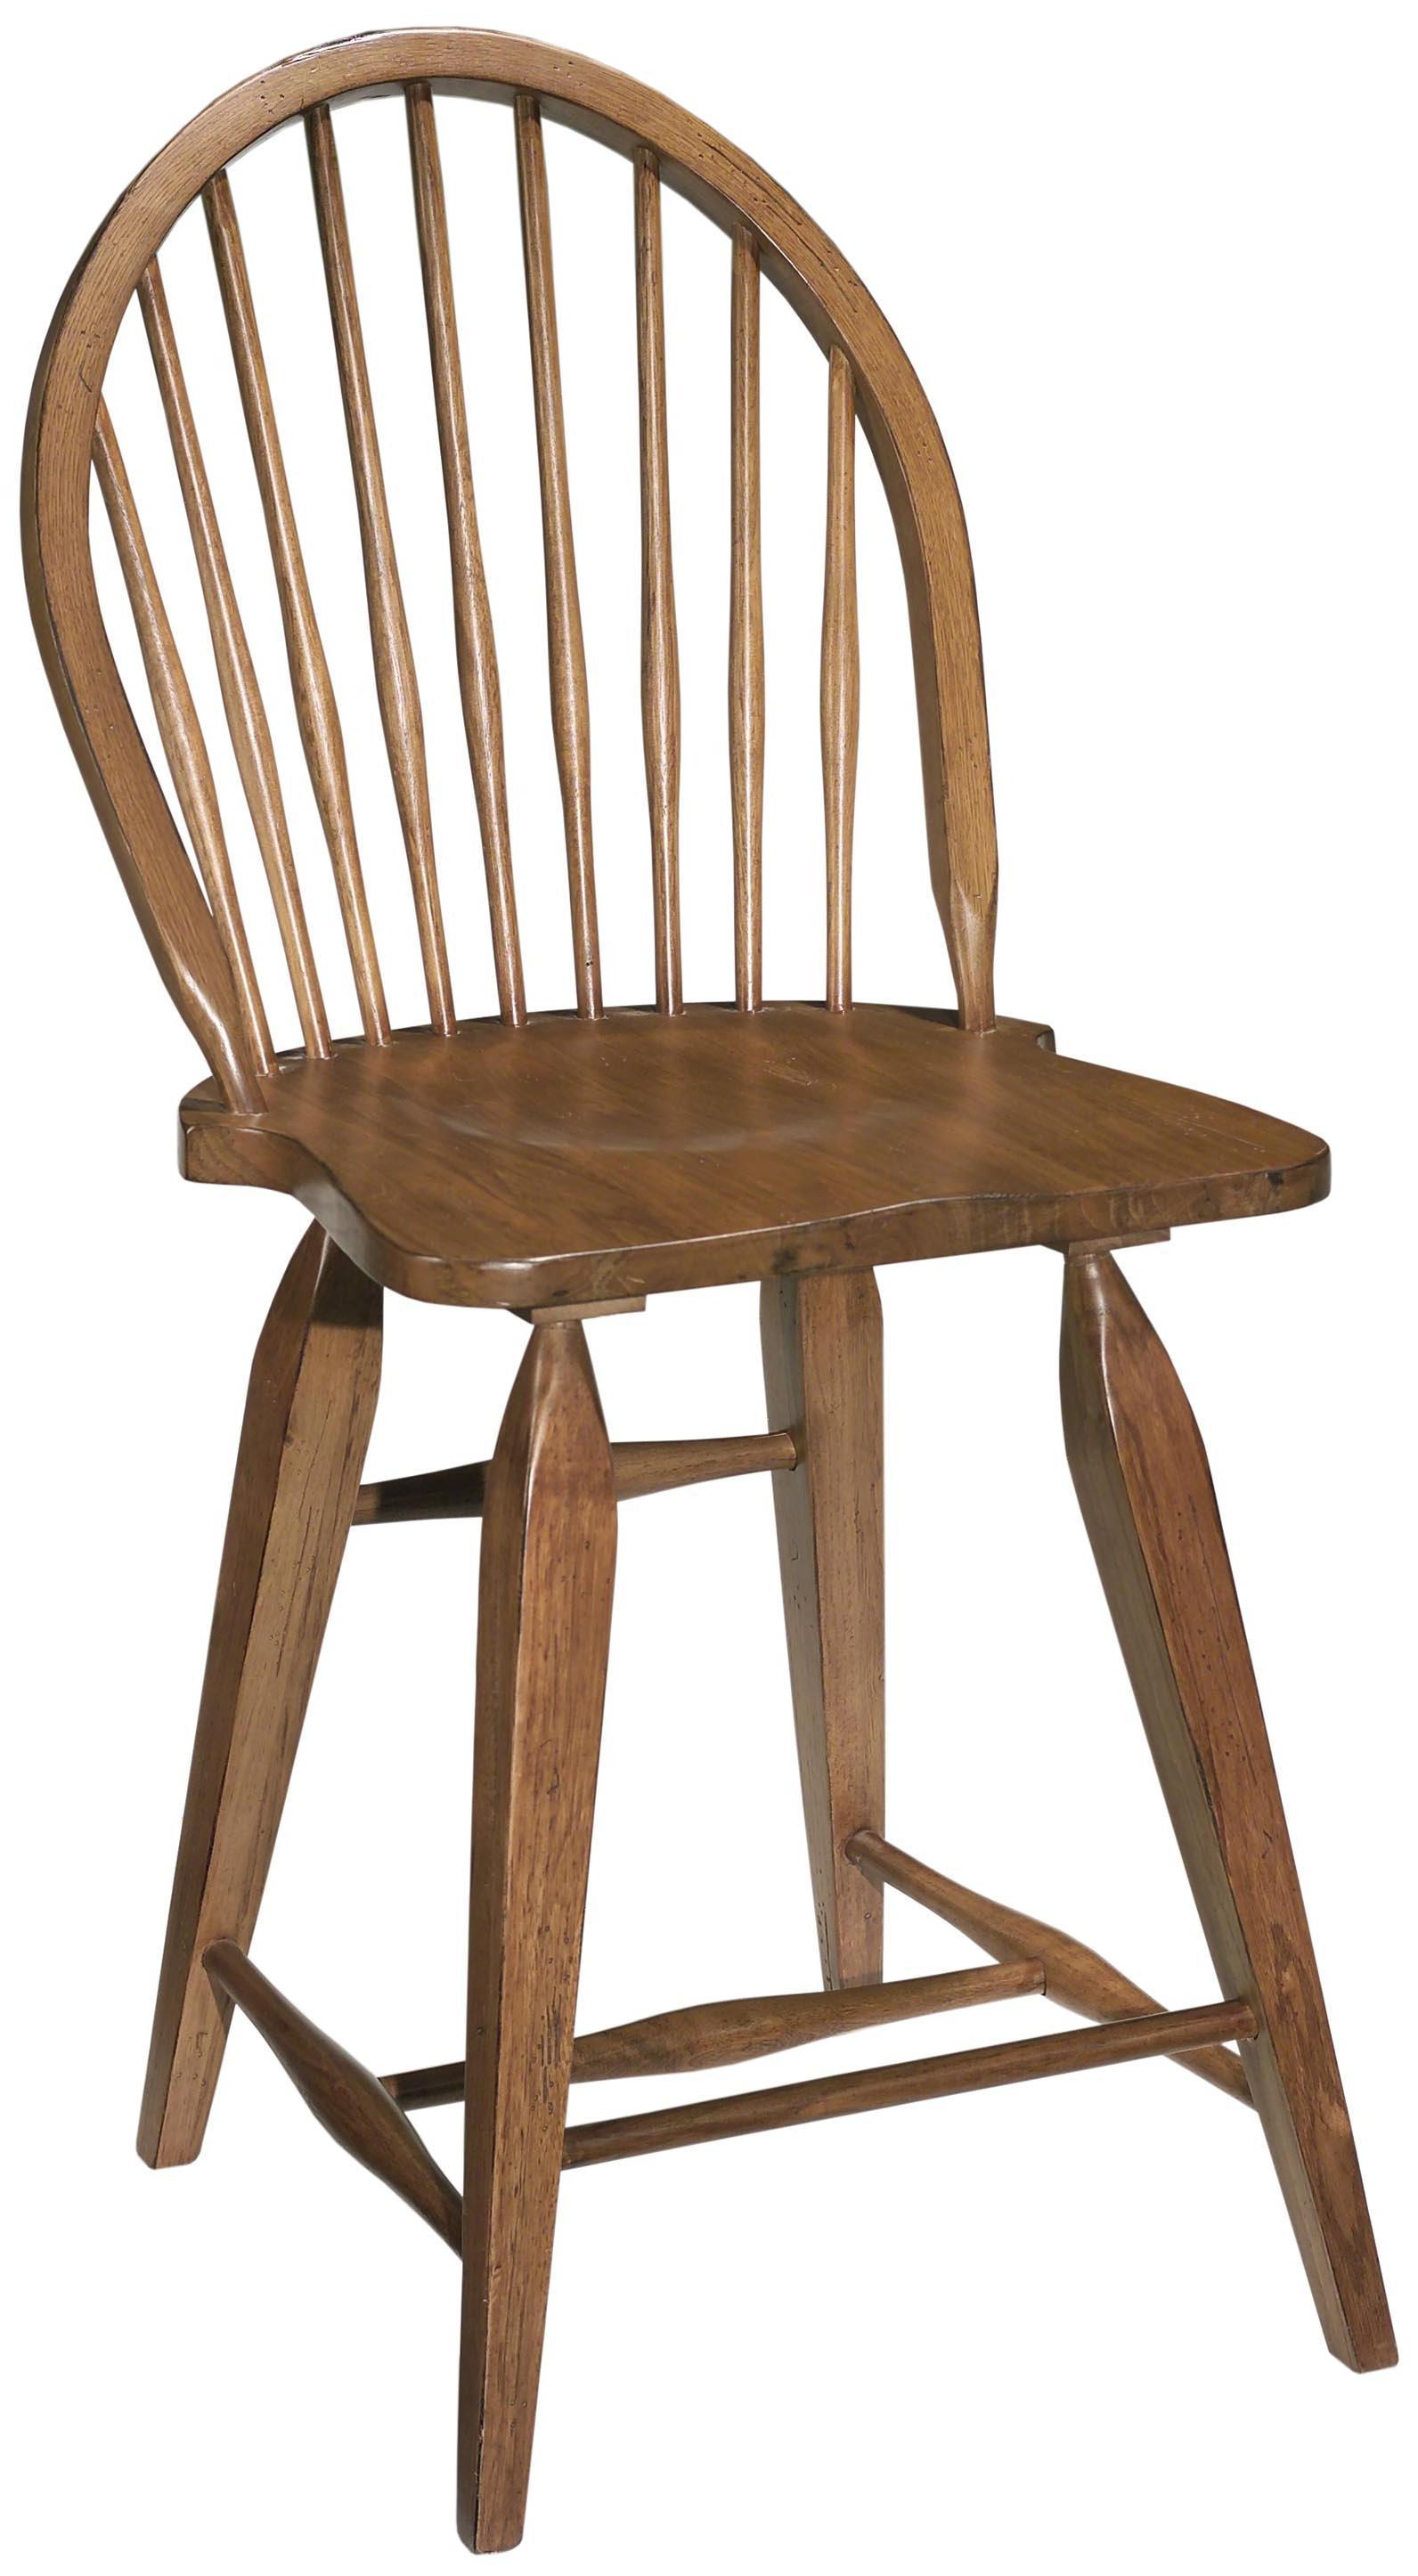 Broyhill Furniture Attic Heirlooms Windsor Counter Stool   Pedigo Furniture    Bar Stools